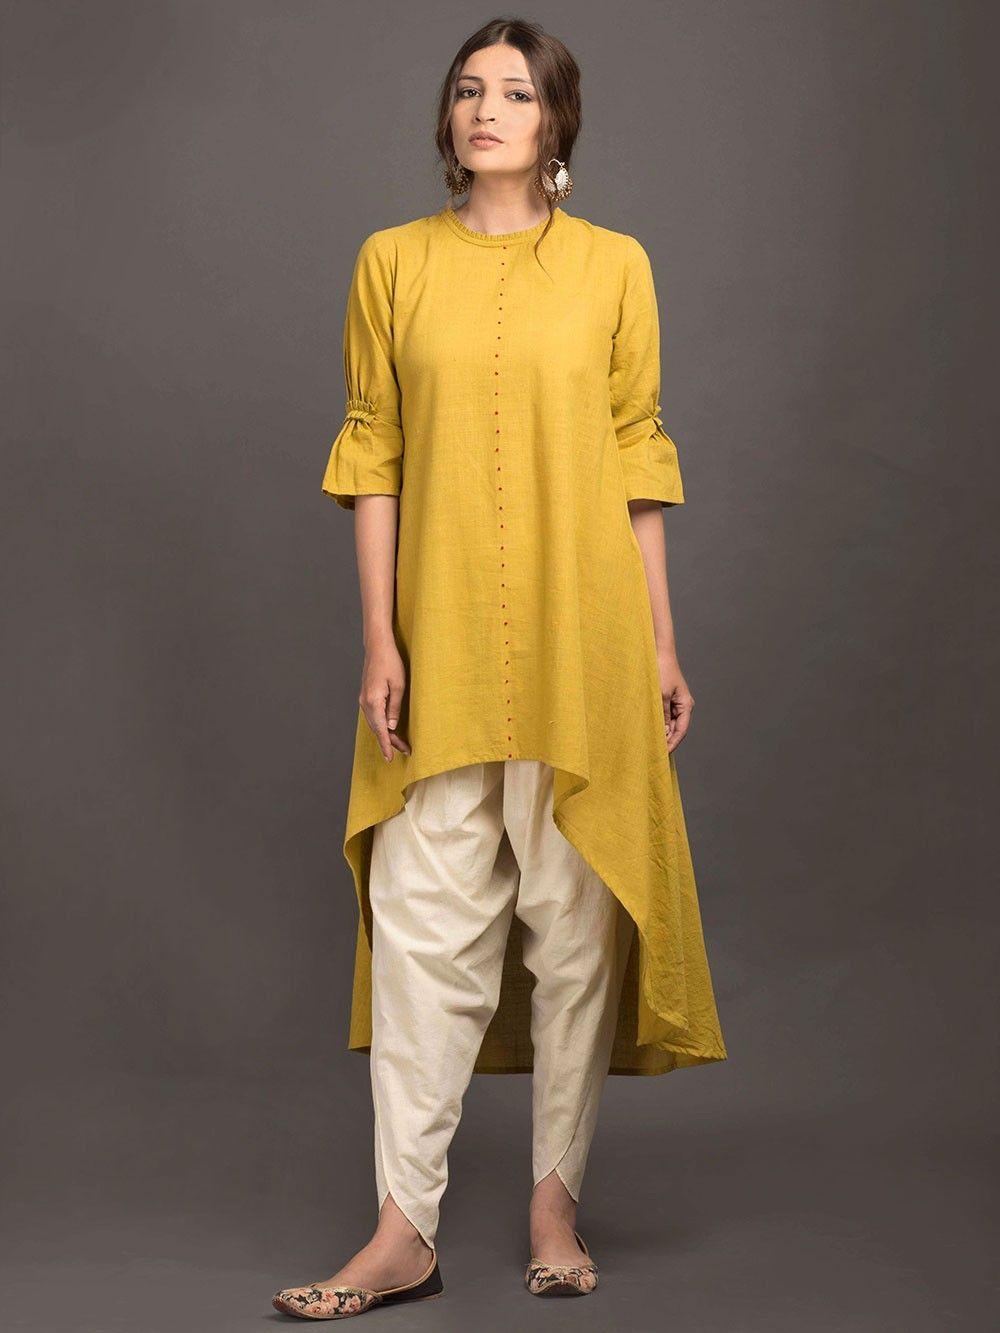 6f4a8a67f8 Mustard Yellow Khadi High Low Kurta | fashion | Khadi kurta, Indian ...